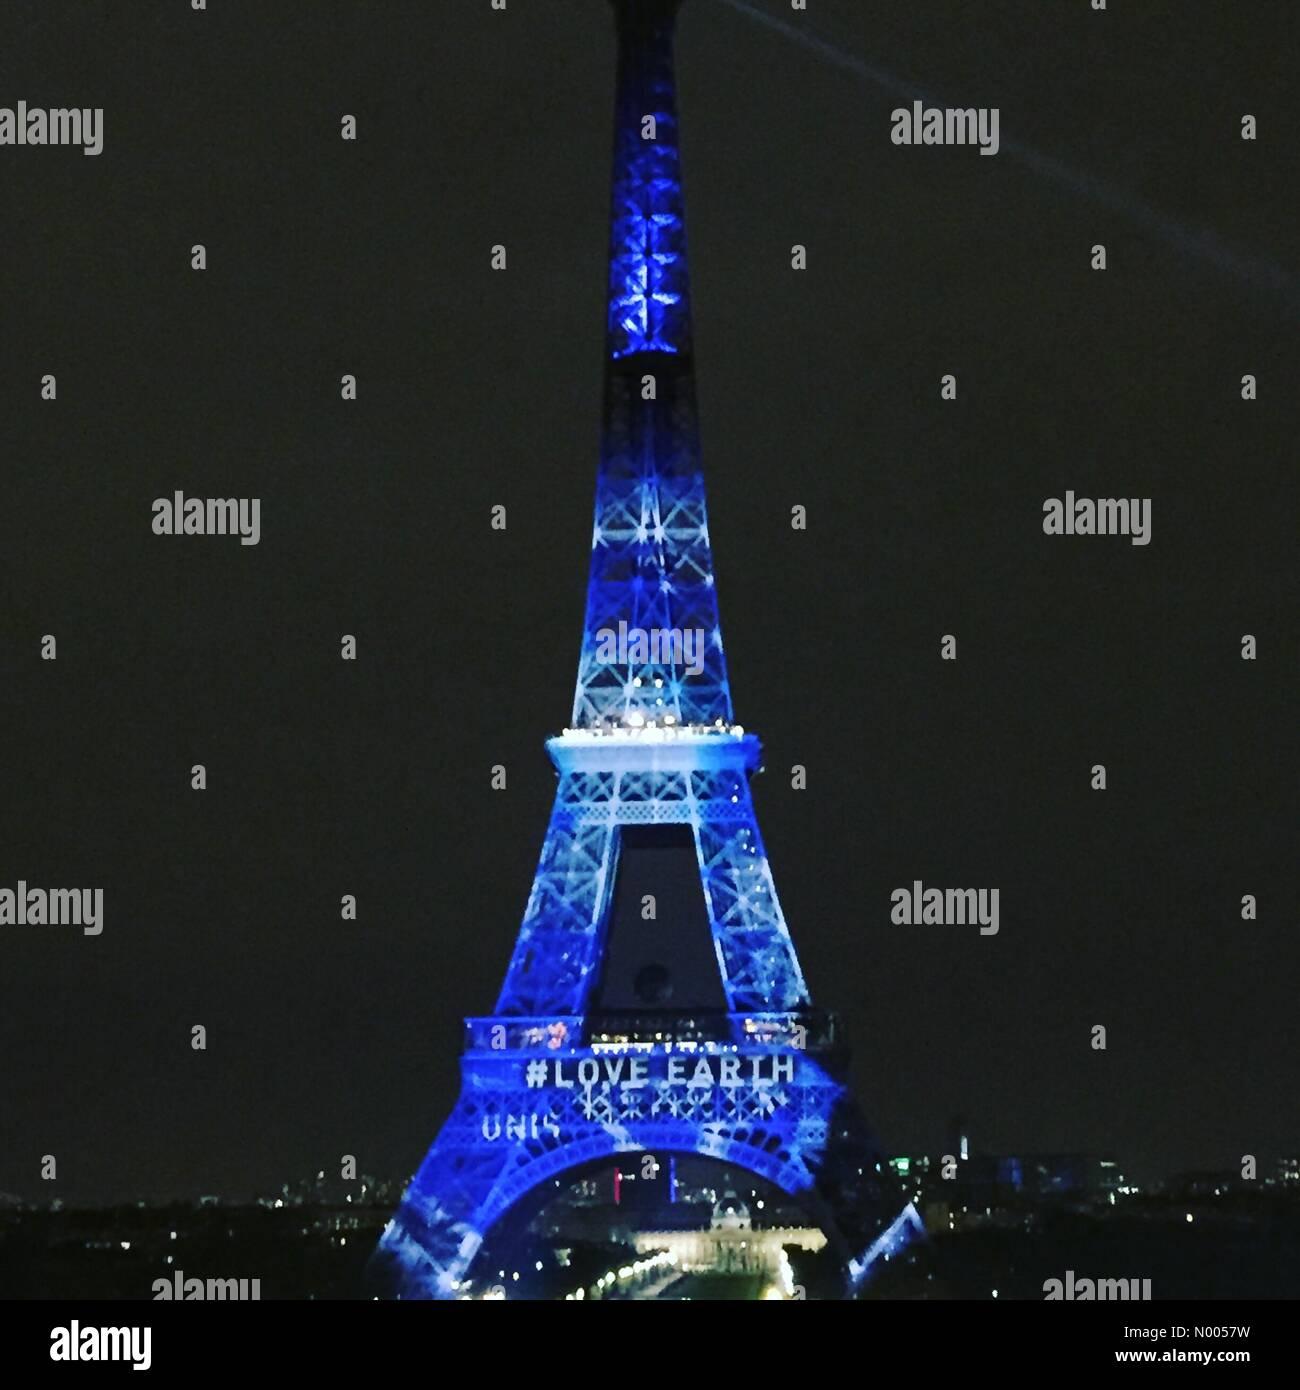 75016 Paris-16E-Arrondissement, France. 29th Nov, 2015. Eiffel Tower #loveearth #COP21 Credit:  jaardavin/StockimoNews/Alamy Stock Photo